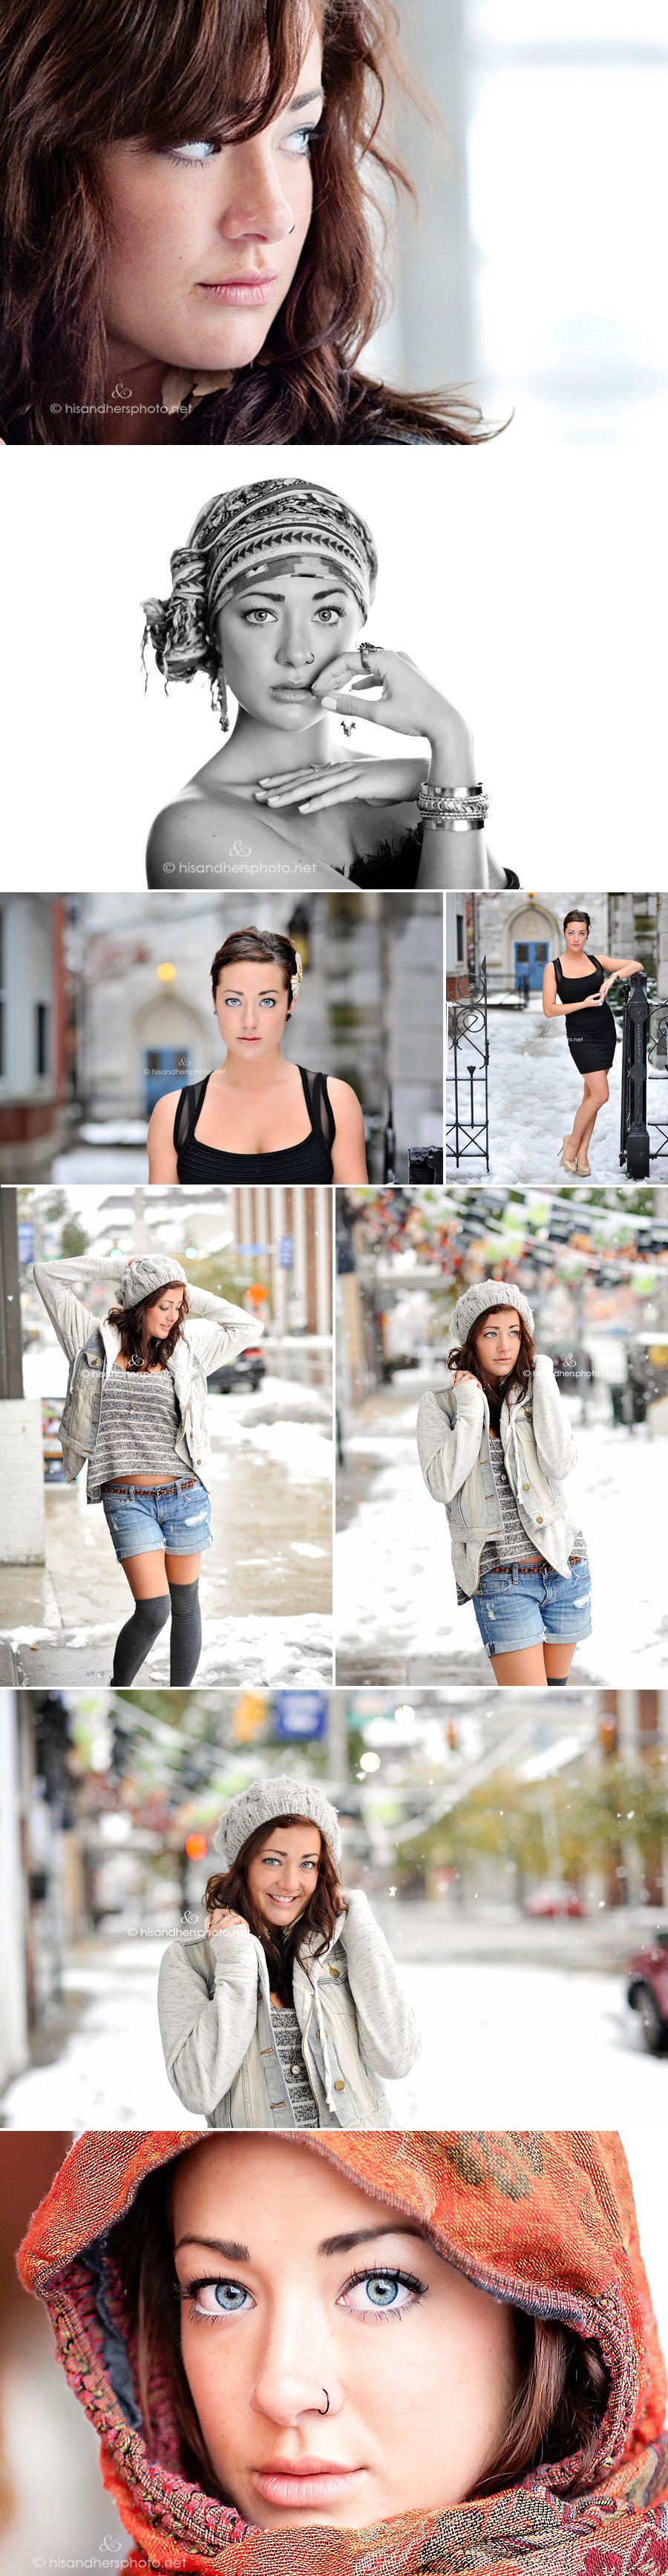 Katie, Model Headshot, Modeling Portfolio | Des Moines, Iowa Actor & Model Headshot Photographer